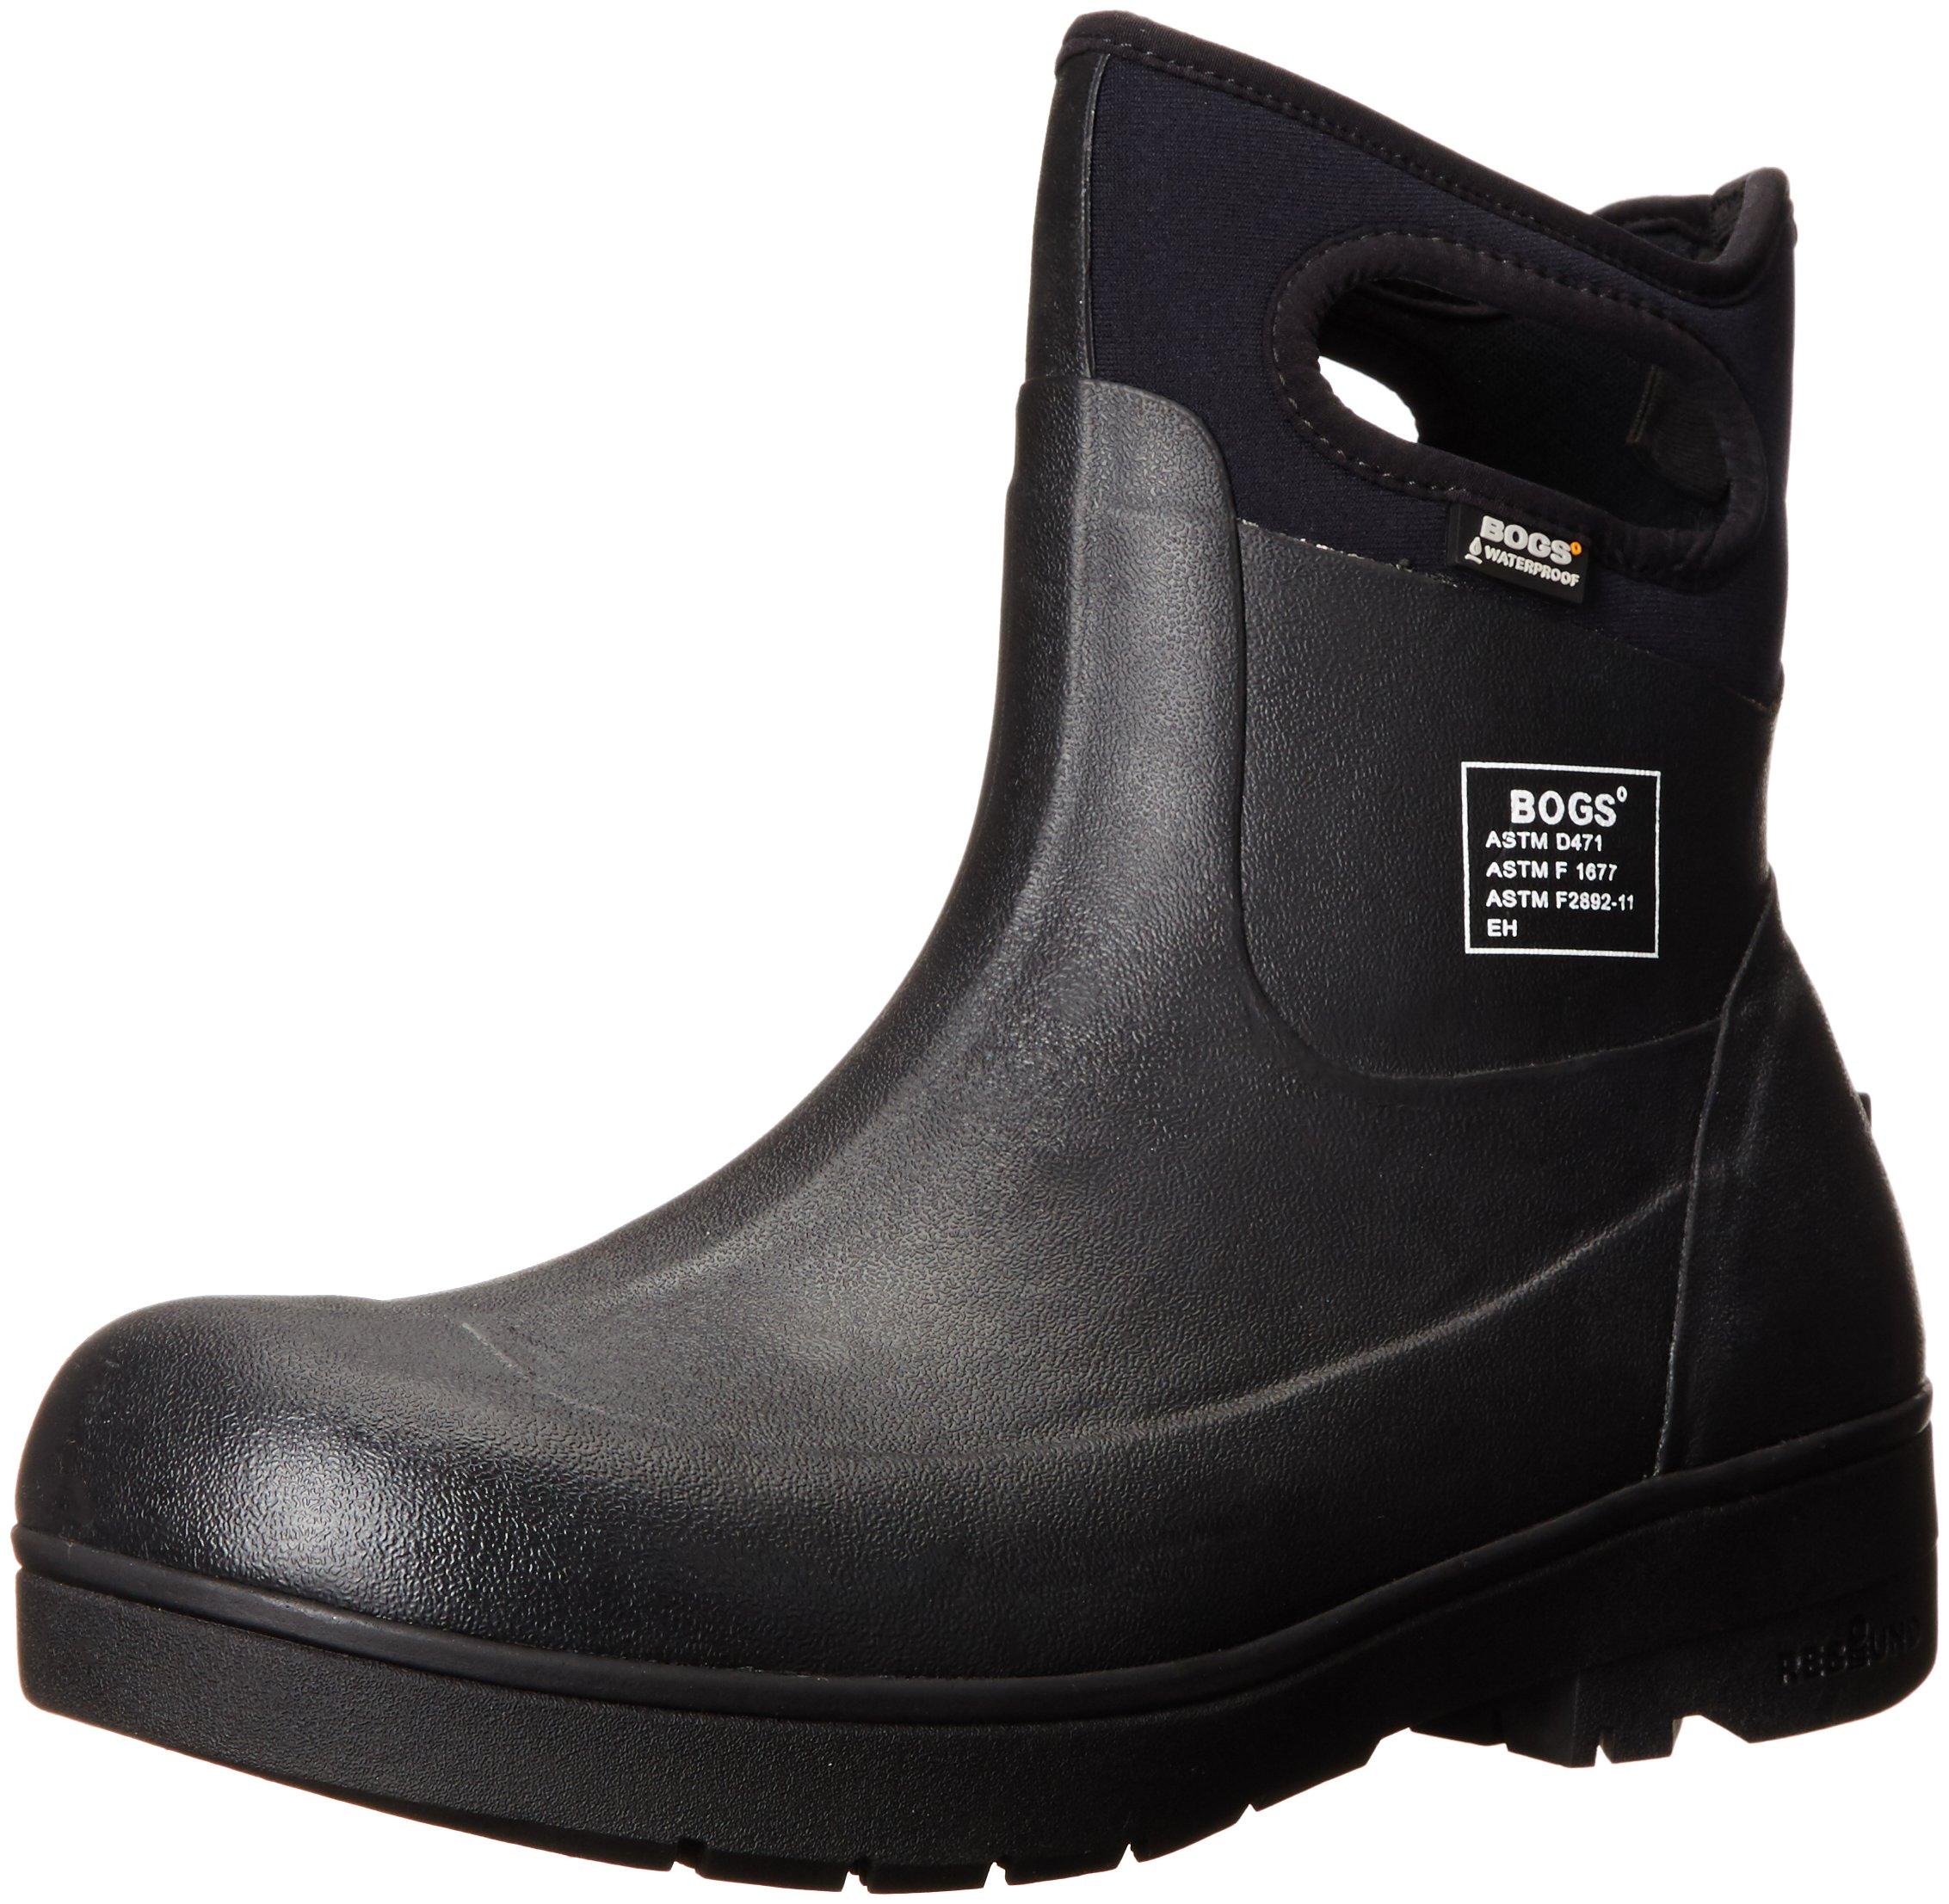 Bogs Men's Turf Stomper Insulated Work Boot, Black, 12 M US